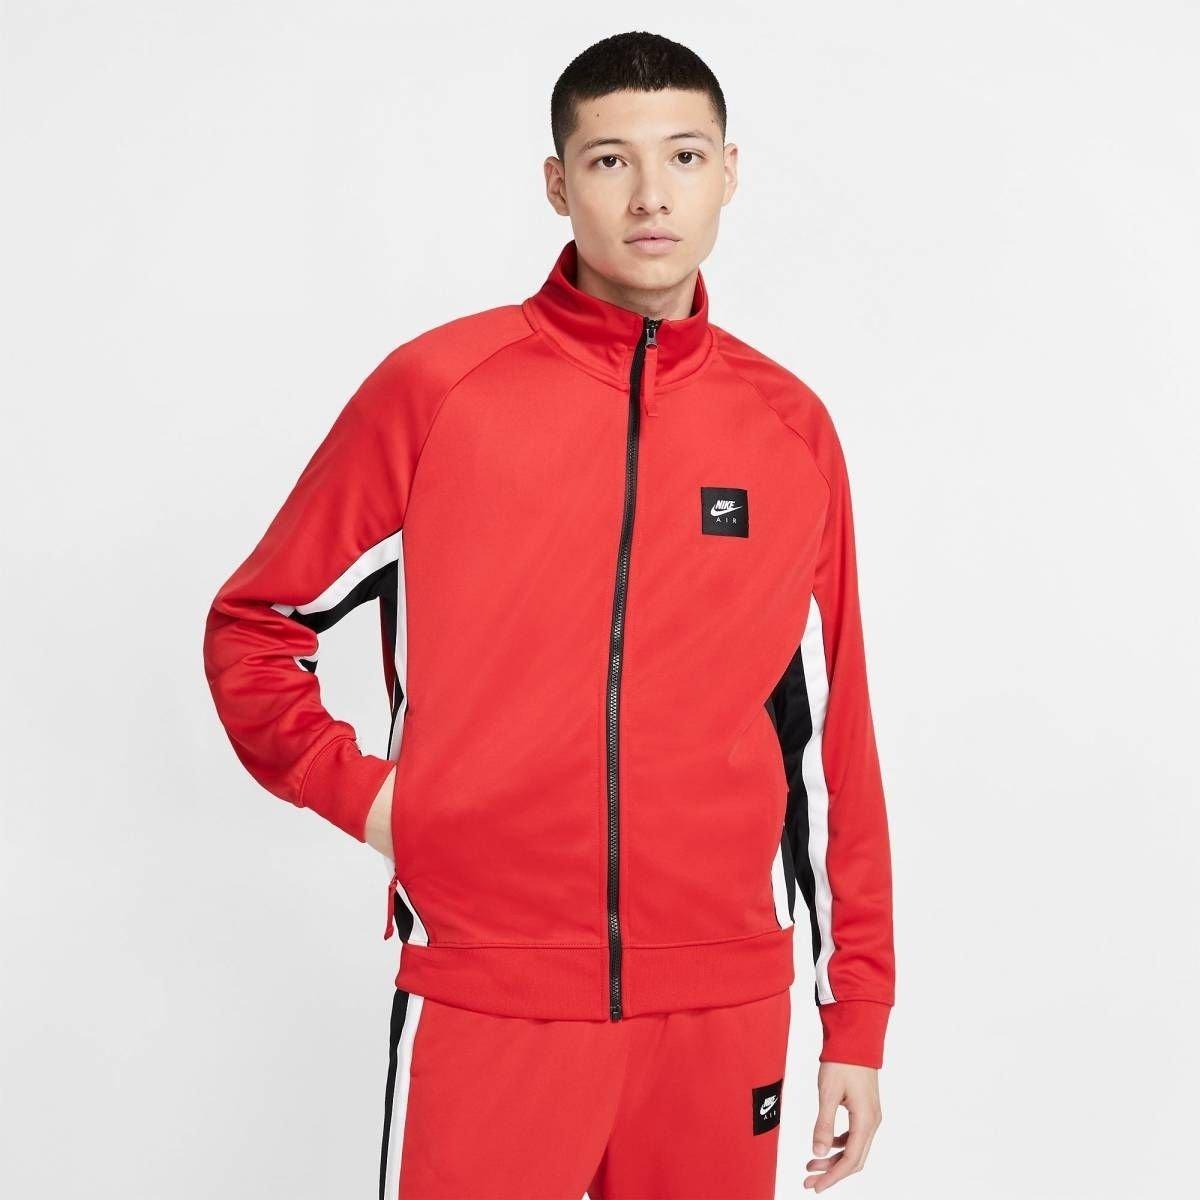 Felpa Nike Air Sportswear...